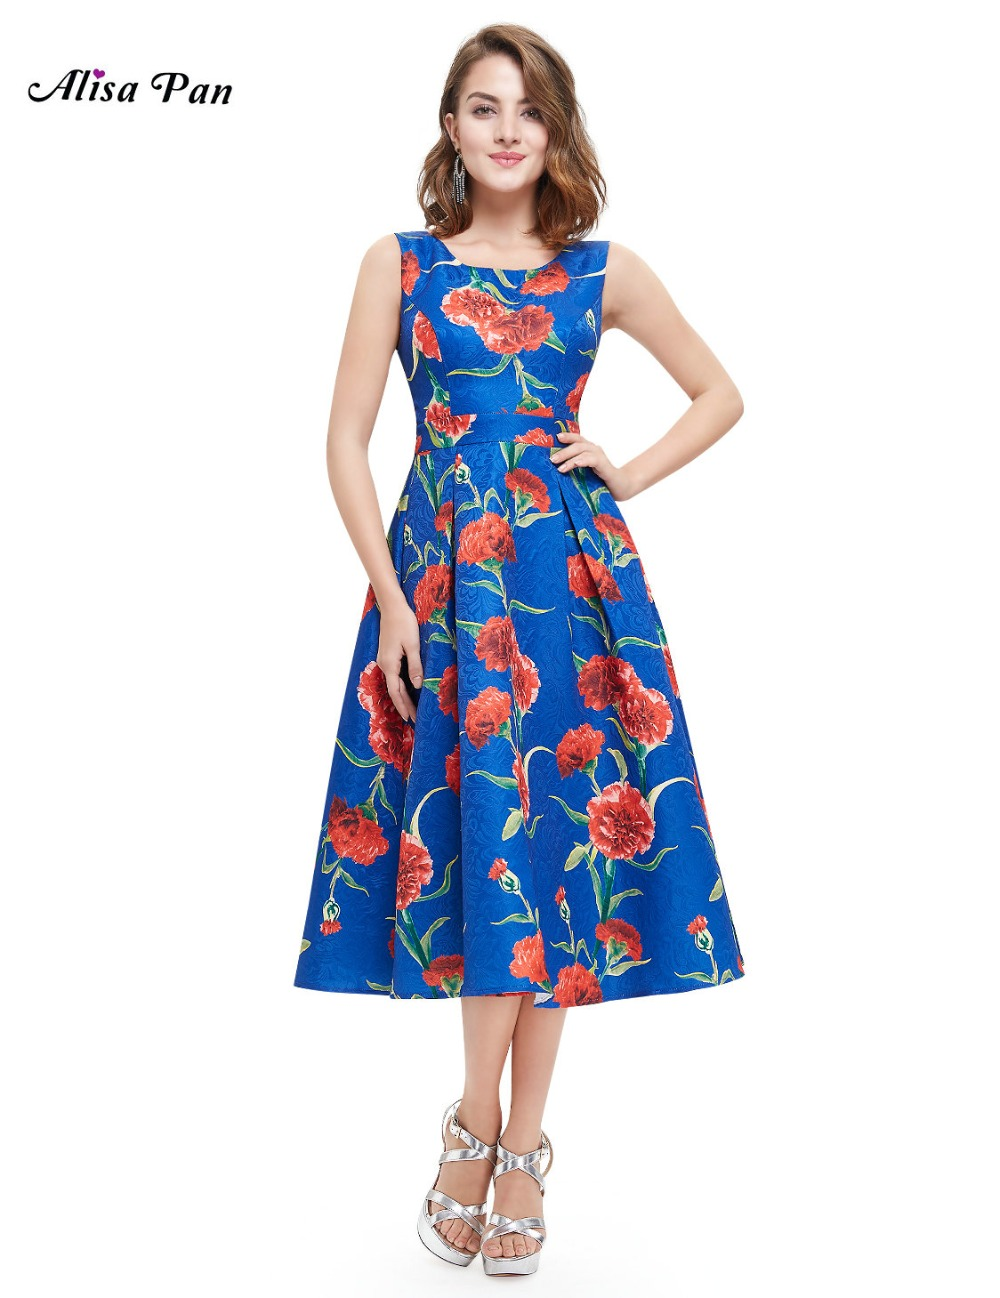 Women Clothing Dresses Alisa Pan AP05443 Simple Fashion Round Neck Short Casual Dress(China (Mainland))